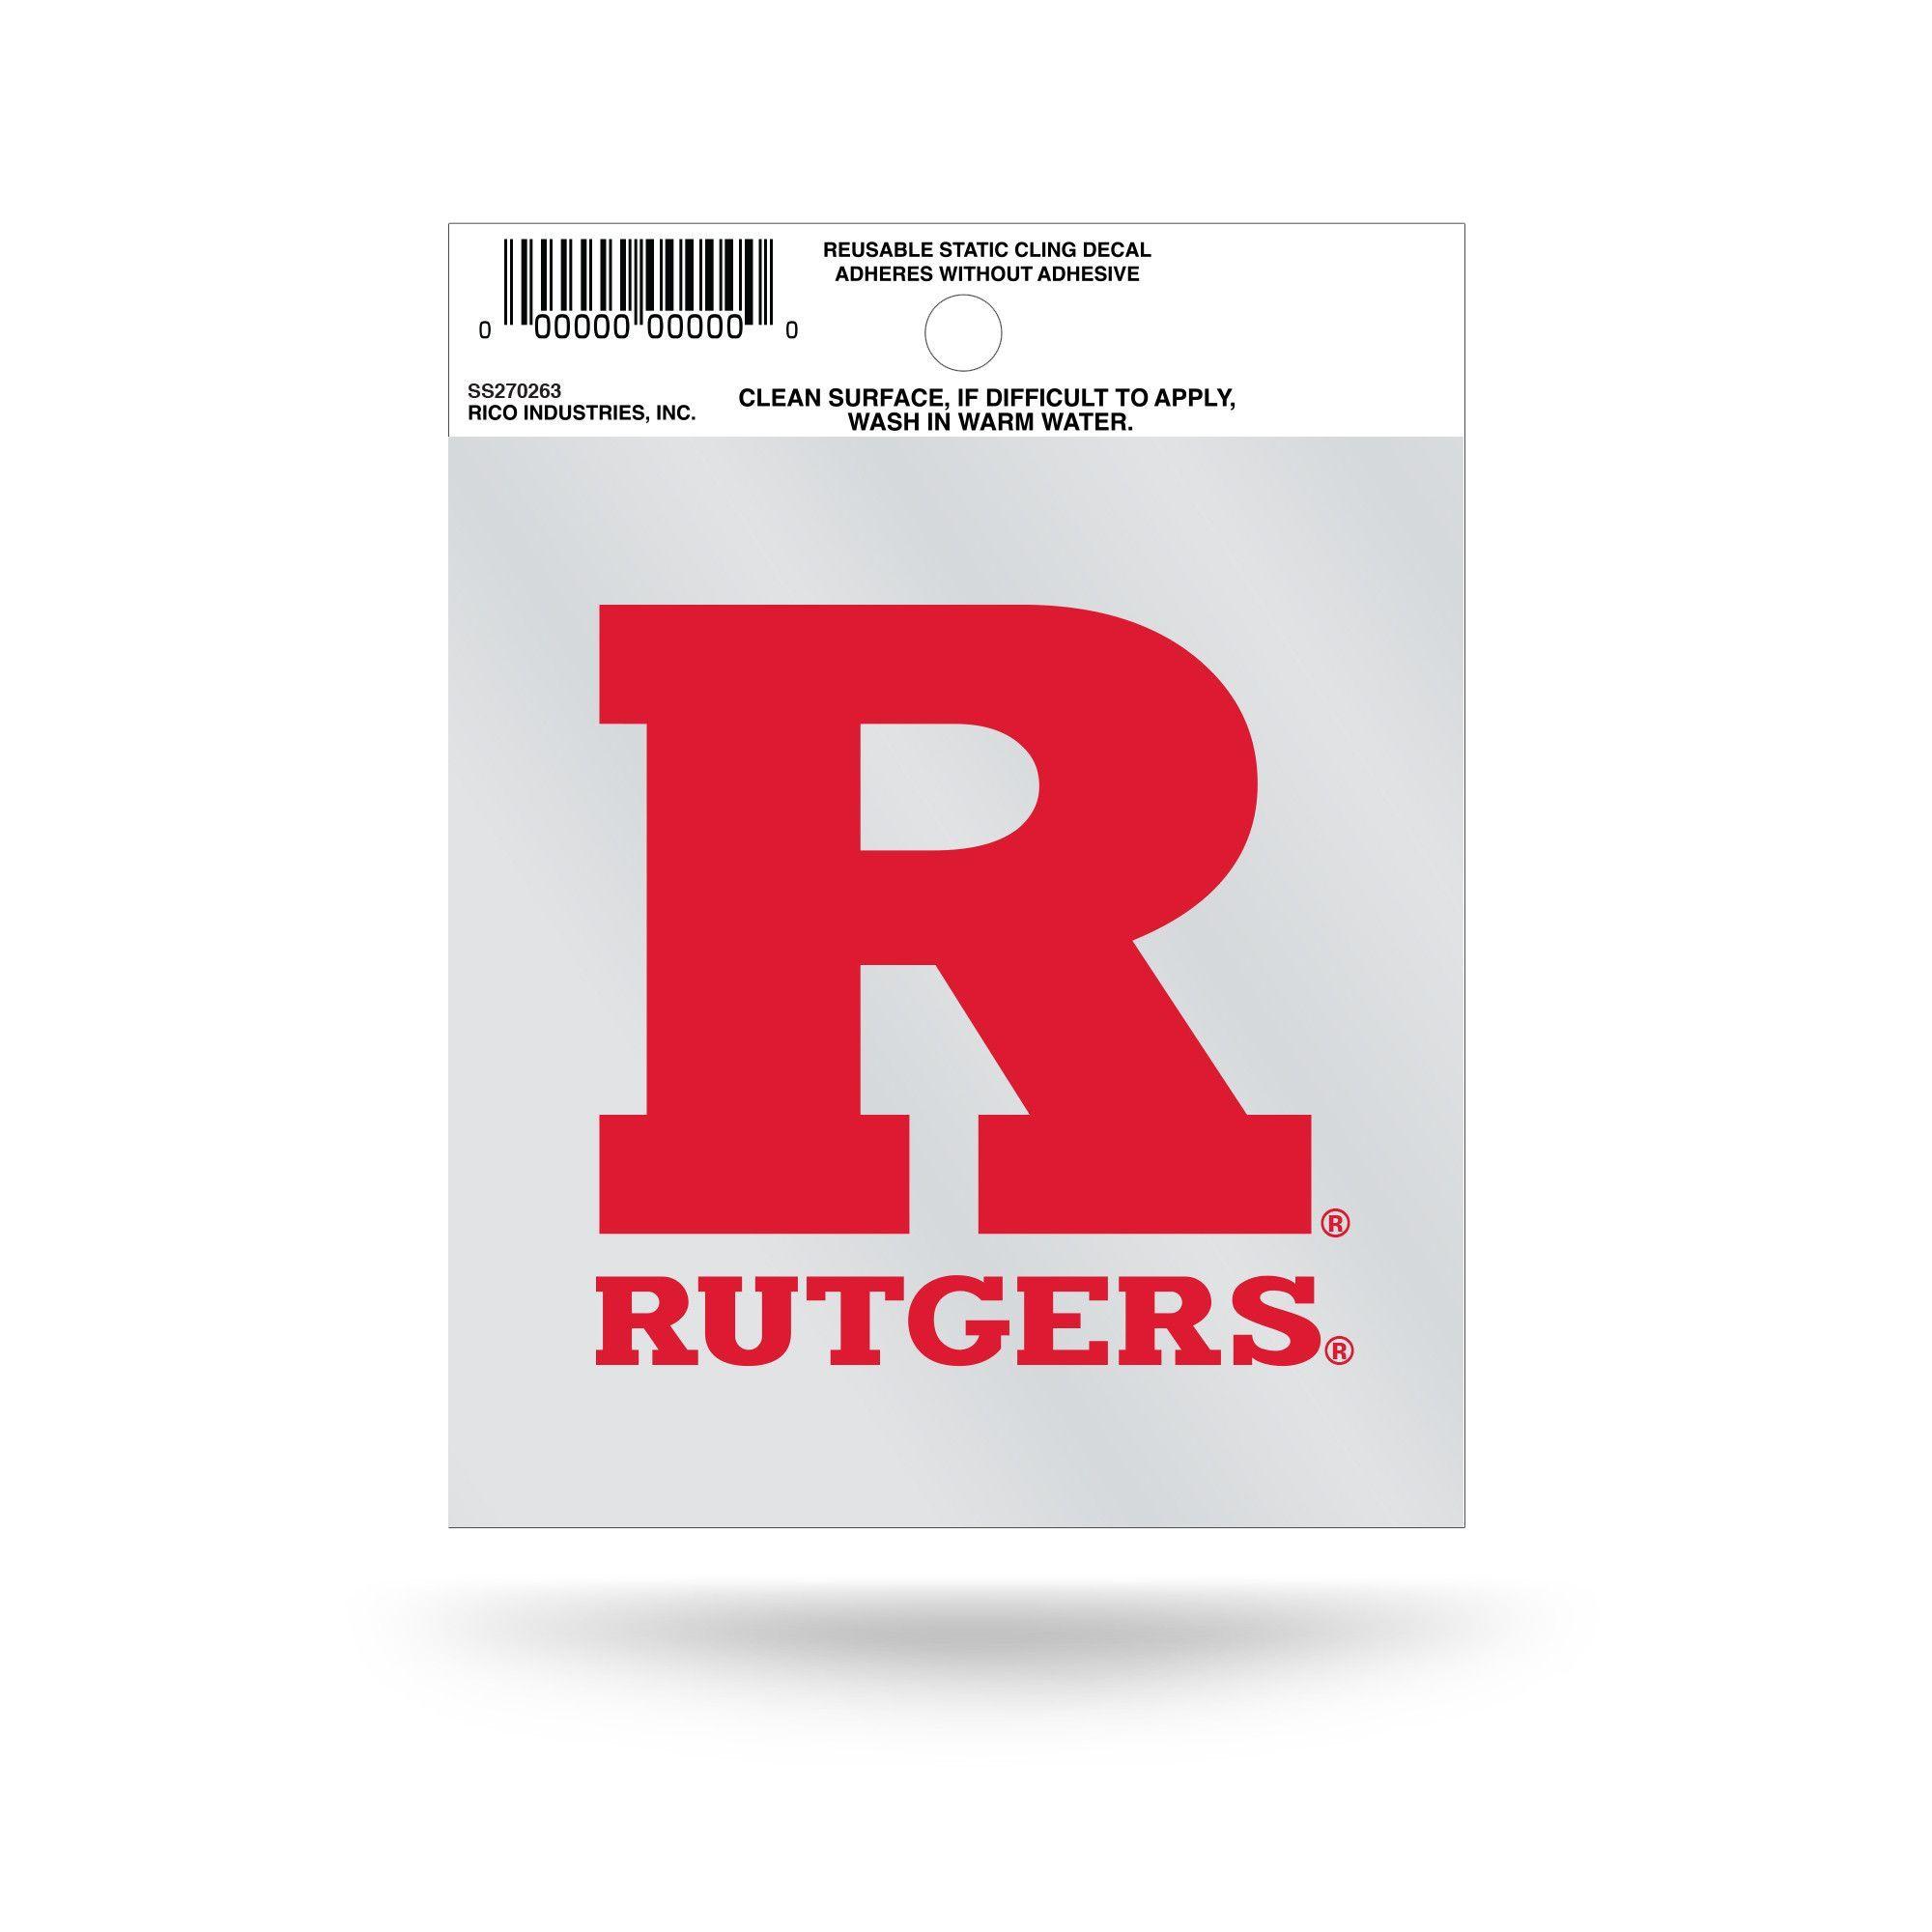 los angeles f6a6b 42bf8 Men s Nike White Rutgers Scarlet Knights Dri-FIT Sideline Swoosh Flex Hat    hats   Hats, White nikes, Baseball hats